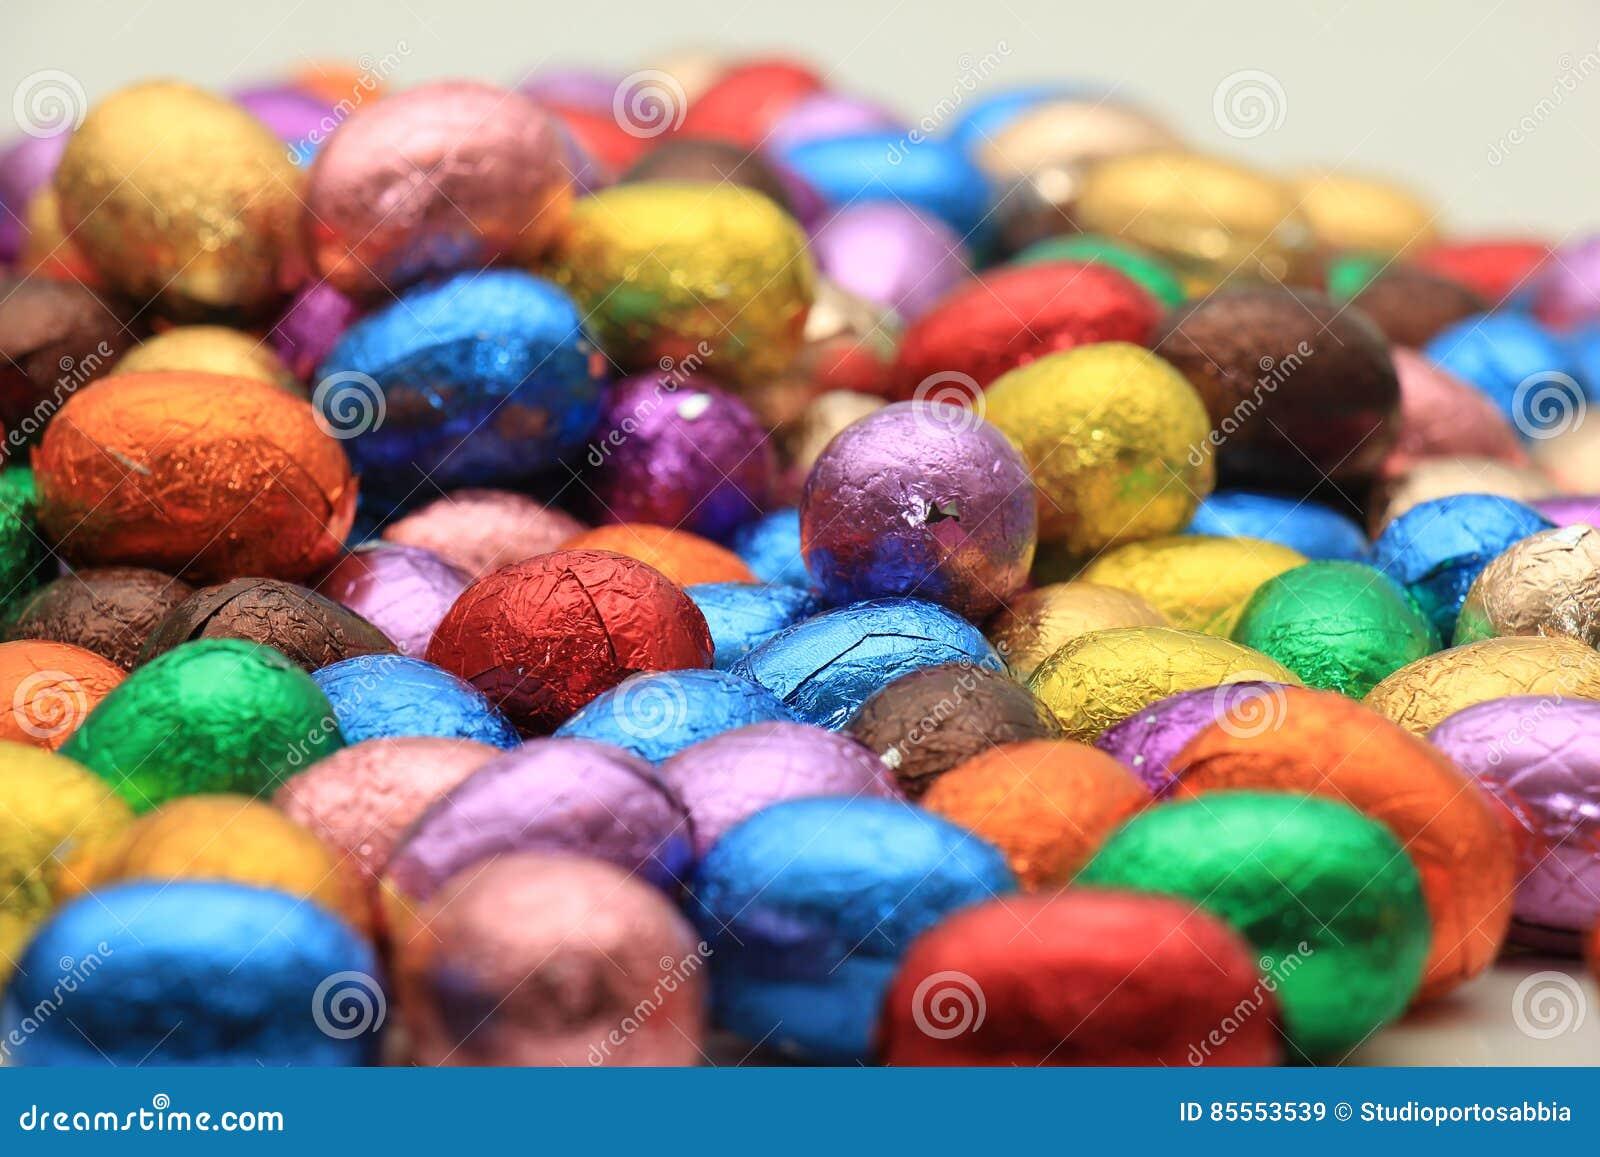 Farbige SchokoladenOstereier